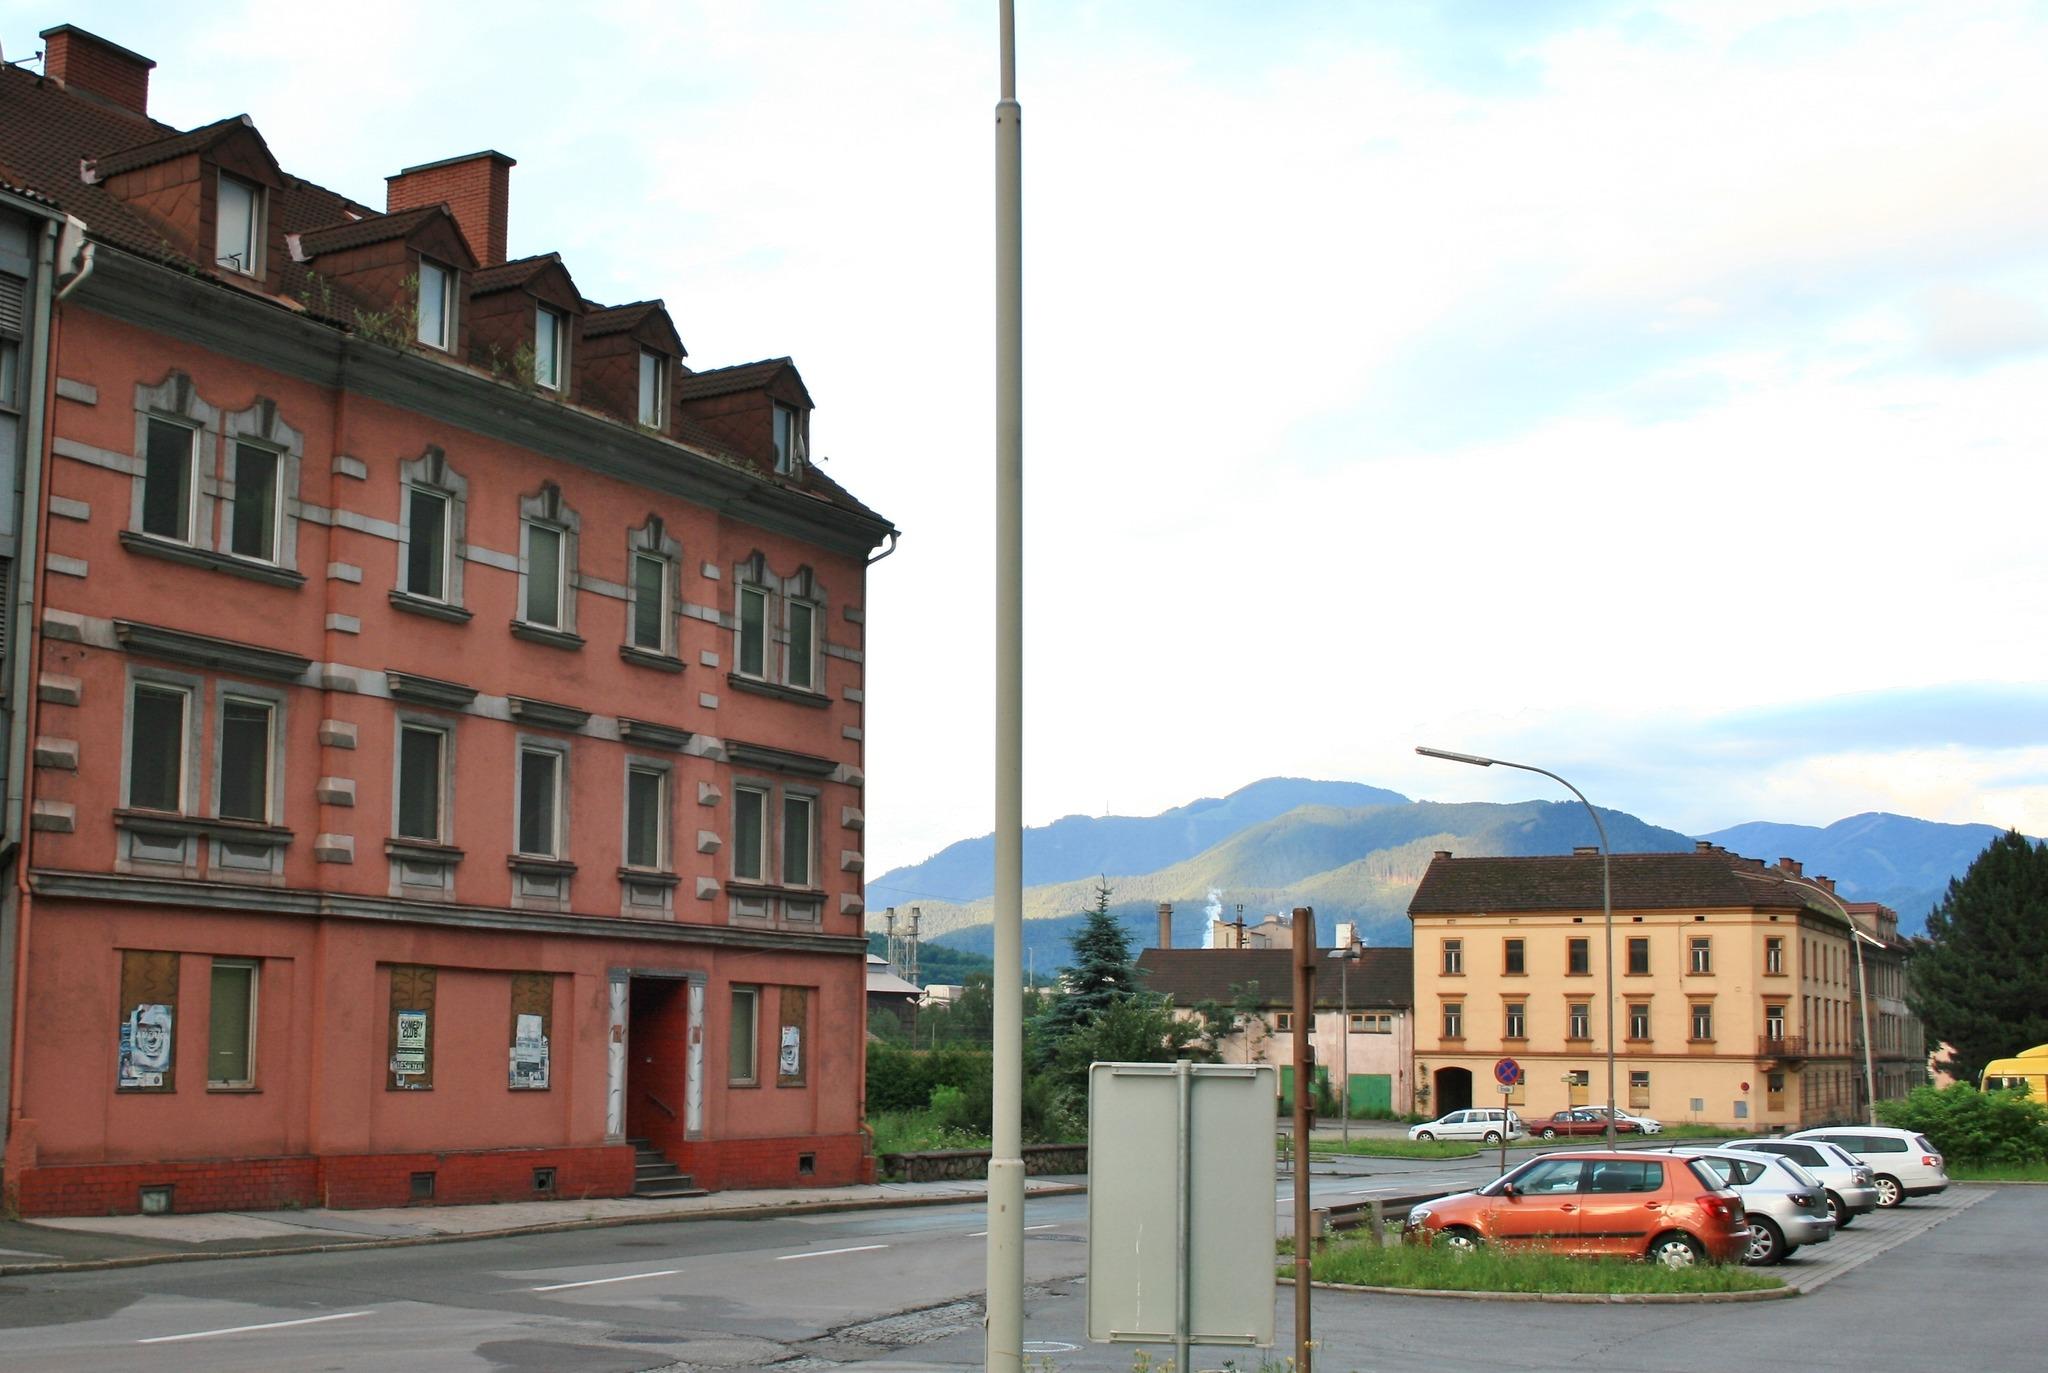 Donawitz in Leoben - Thema auf carolinavolksfolks.com